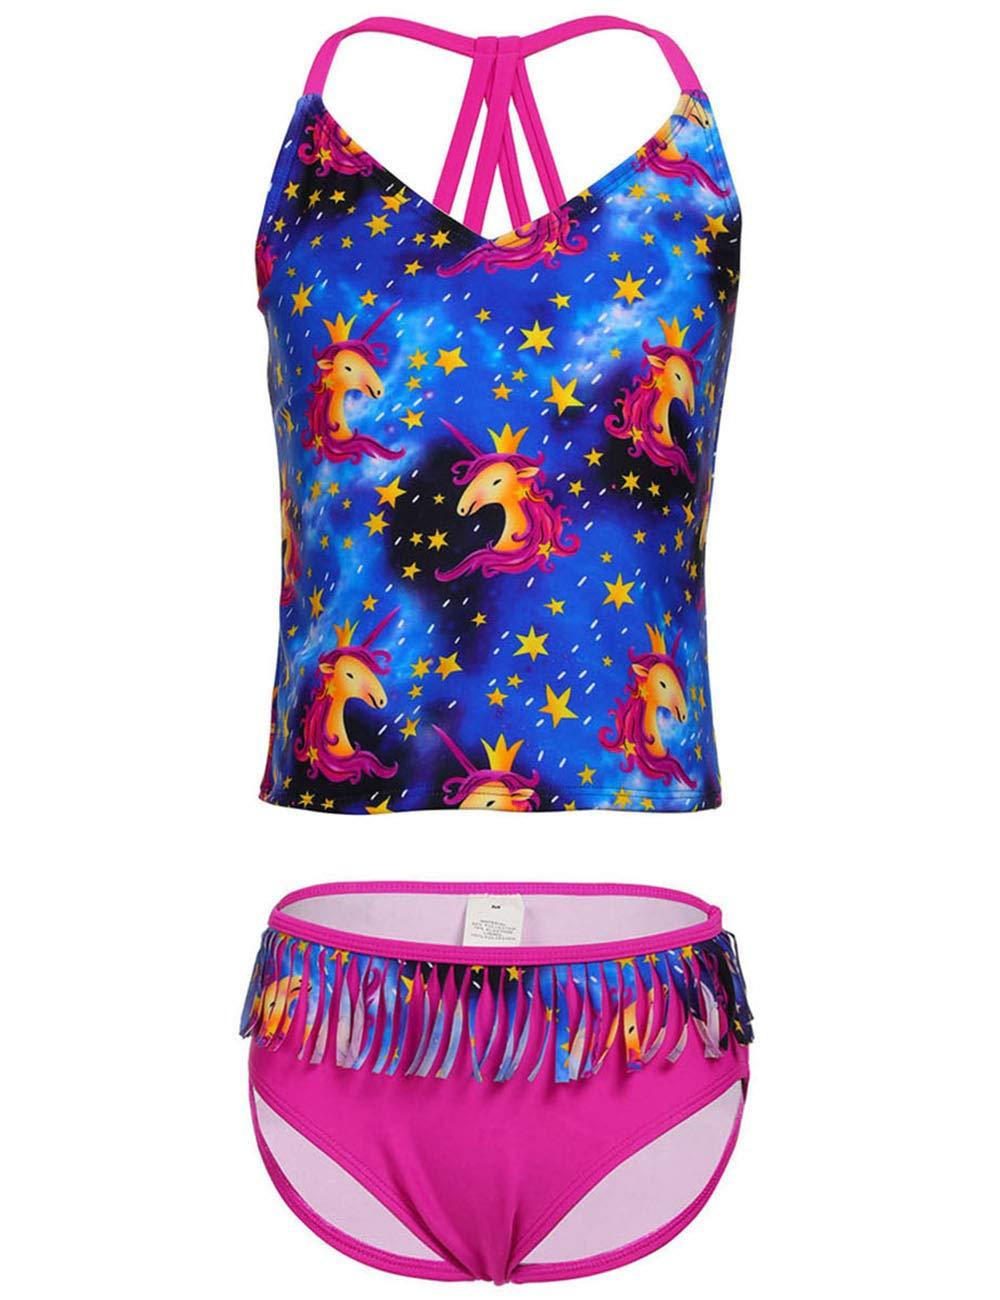 DUSISHIDAN Girls' Two Piece Tankini Swimsuit Sun Protection Bathing Suit, Tassel, Stripe,Rainbow